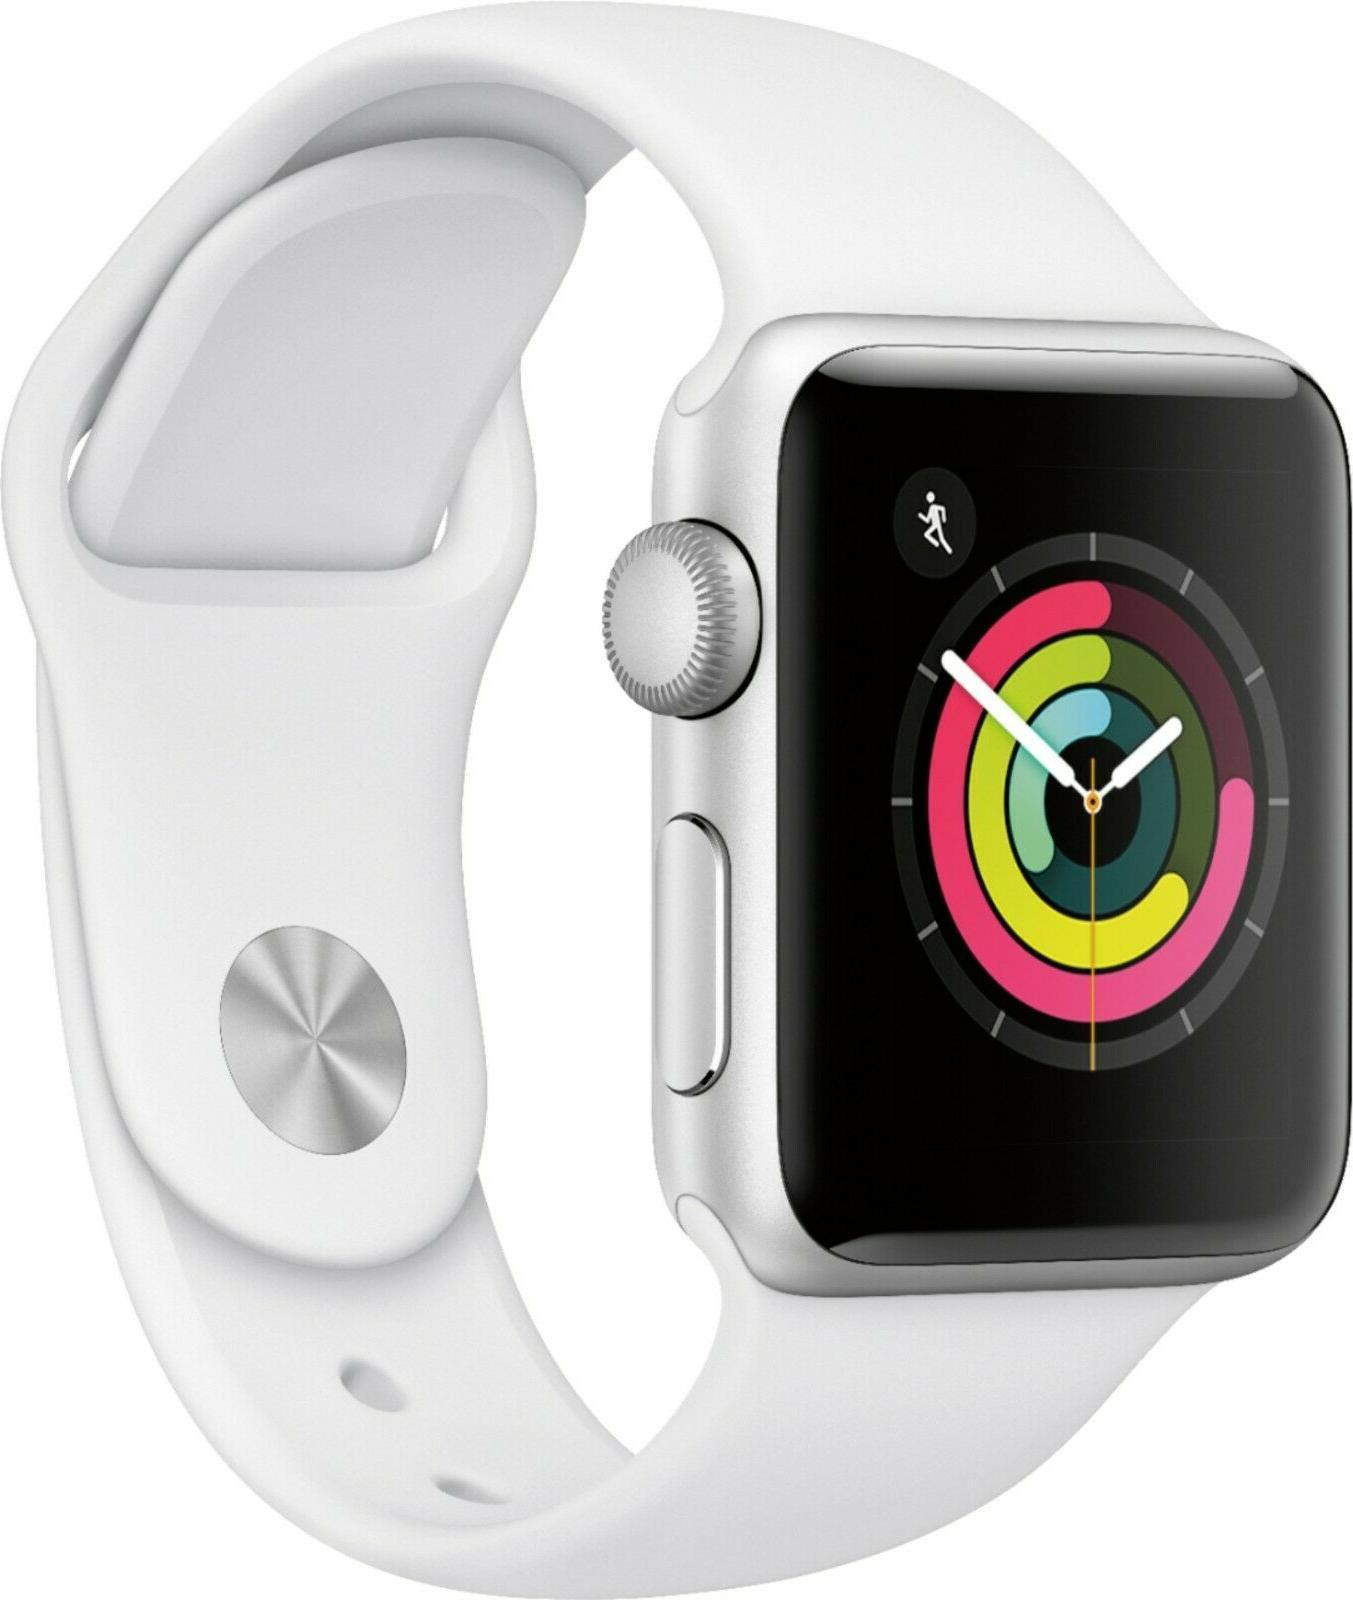 new watch series 3 gps smartwatch 38mm